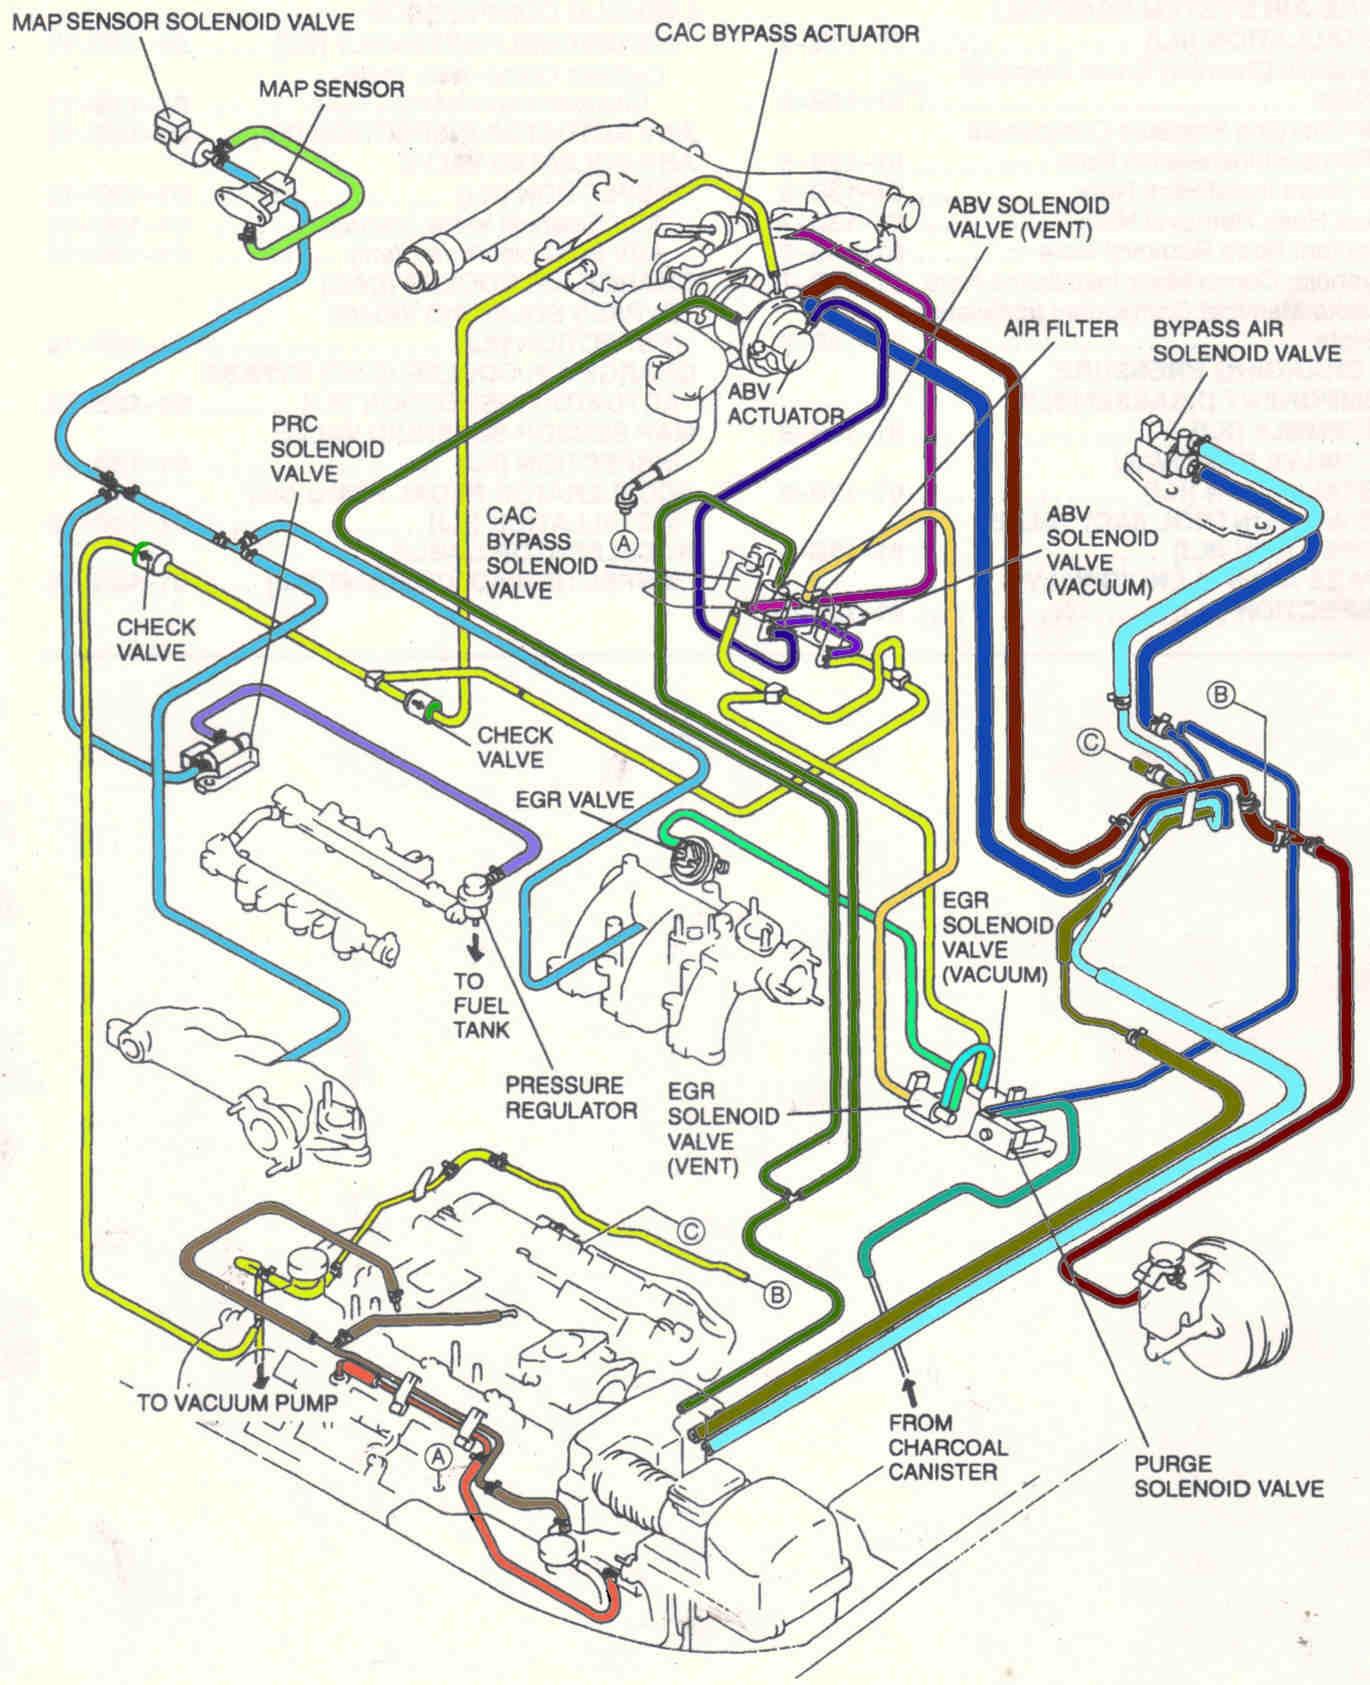 Mazda Mpv 2001 Engine Diagram 2000 Mazda Millenia S Rmp Won T Pass 2000 Mazda forum Mazda Of Mazda Mpv 2001 Engine Diagram